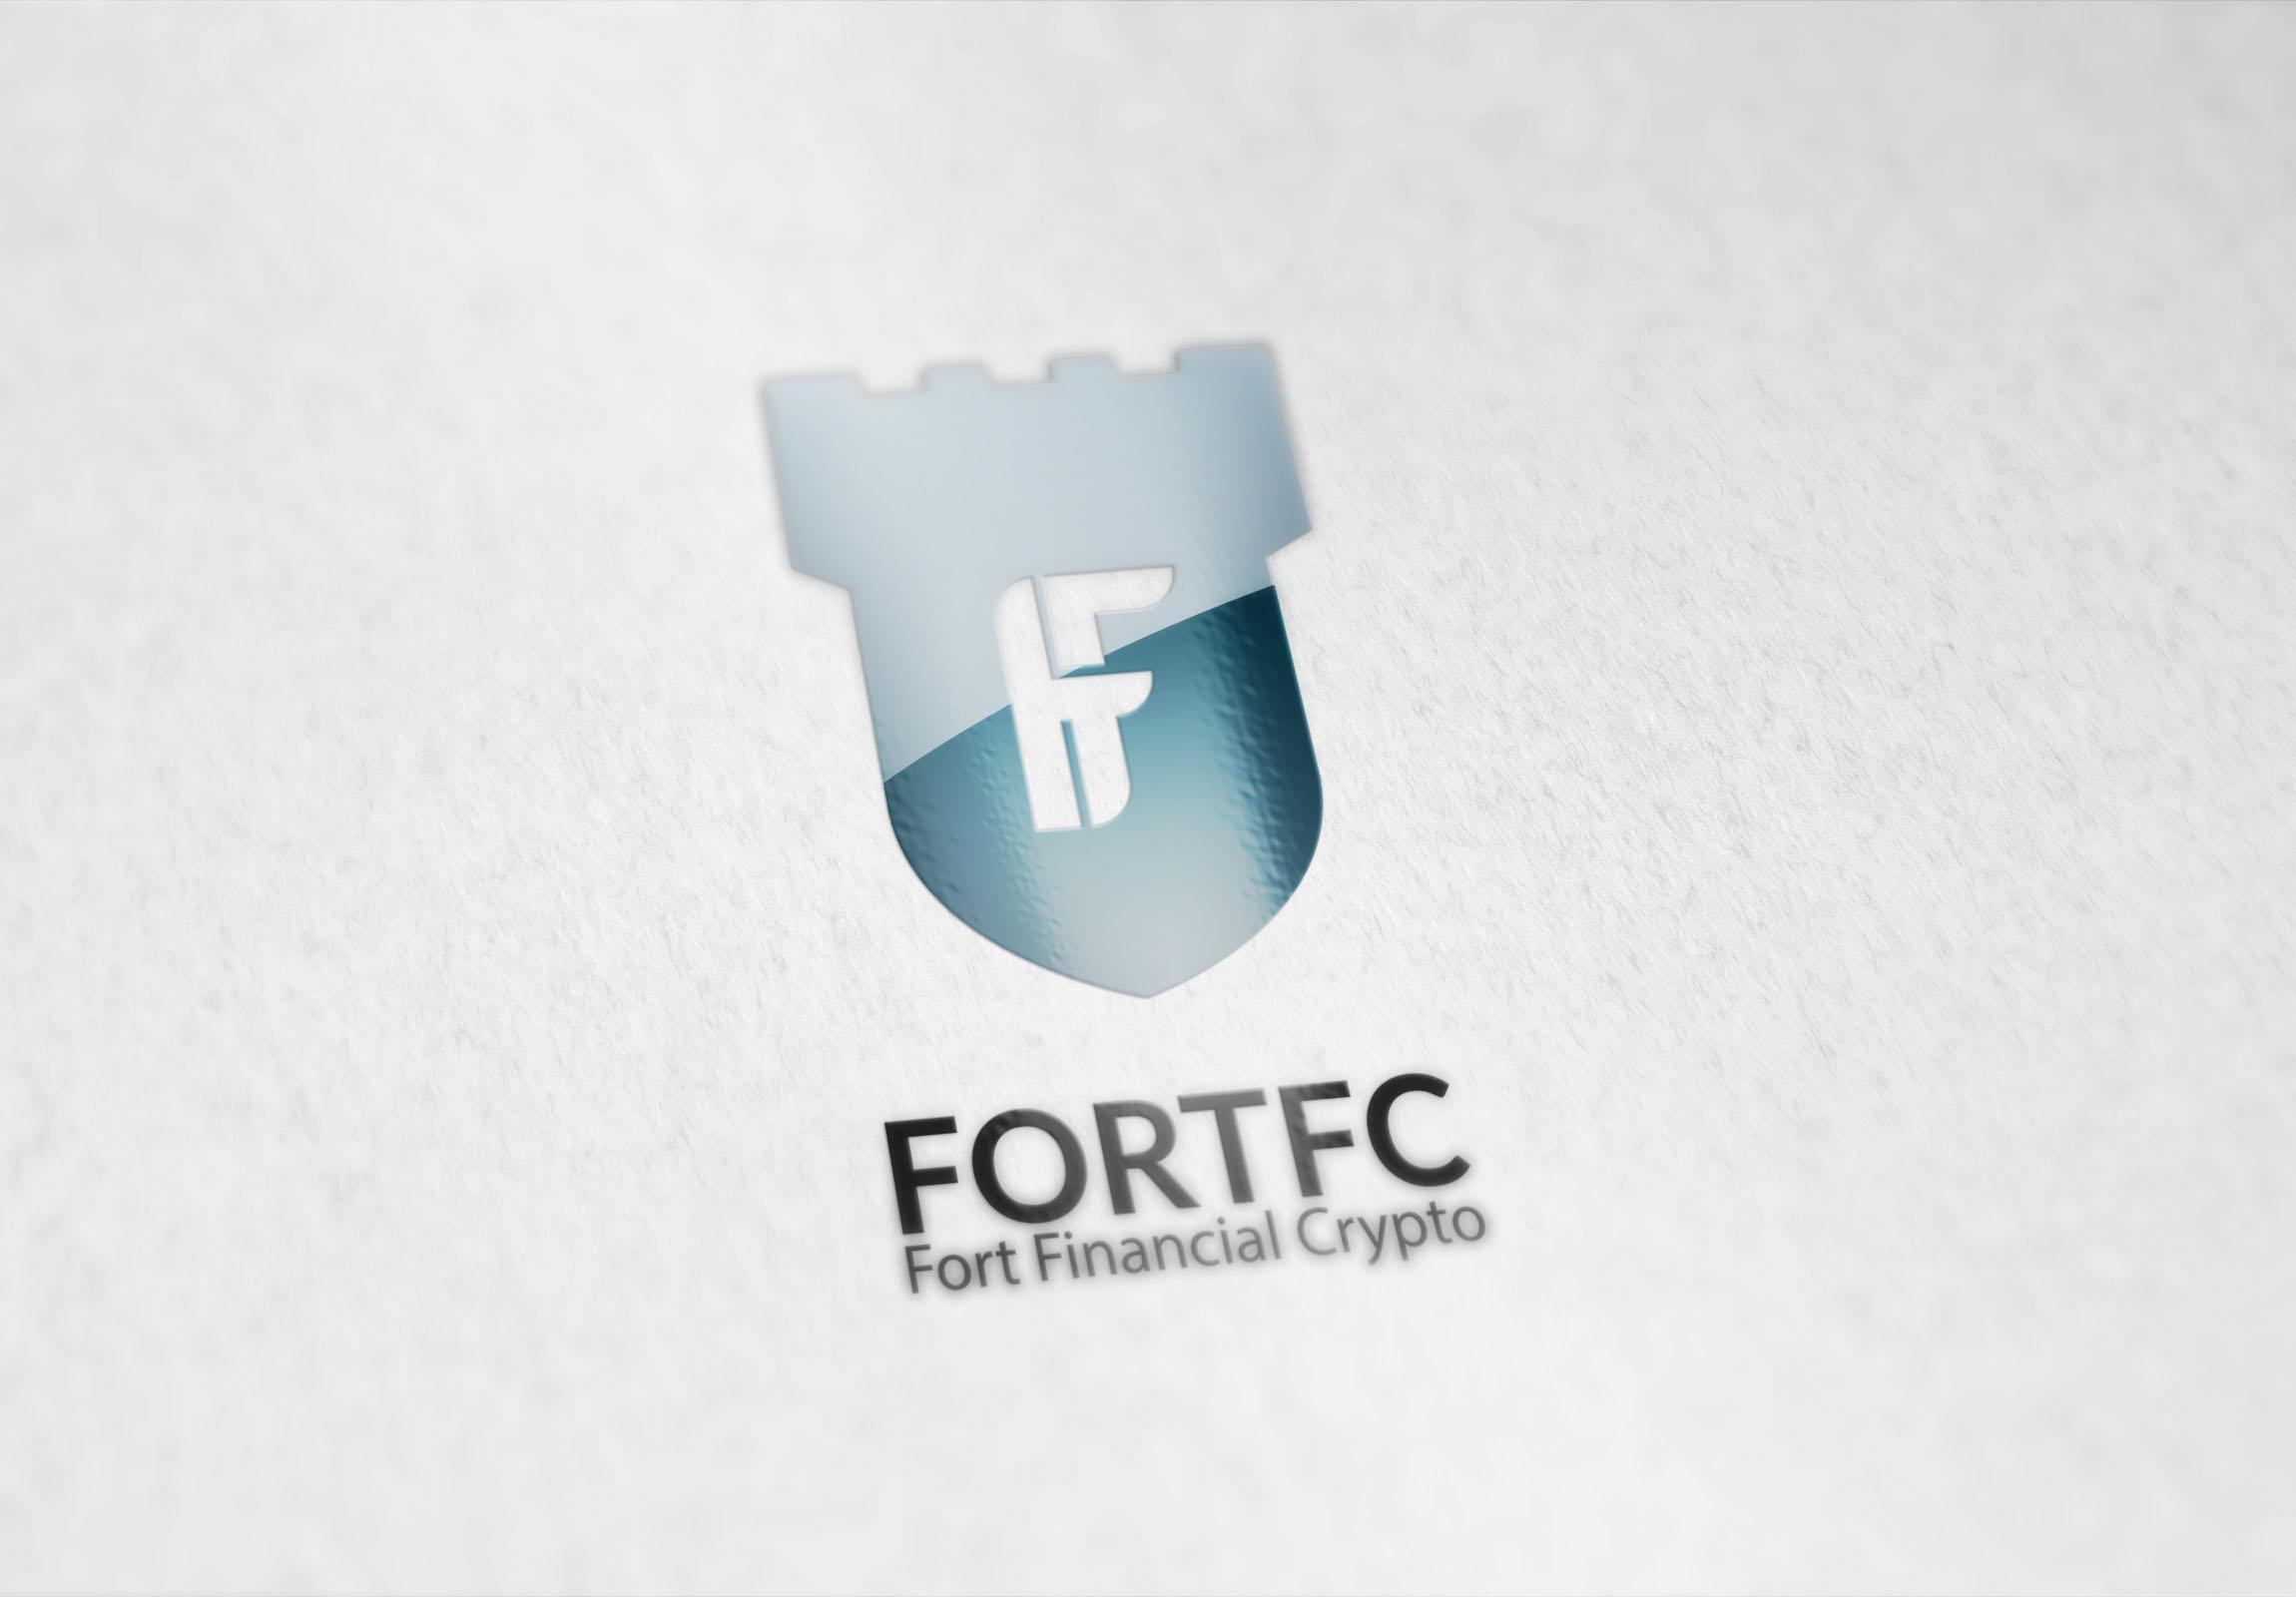 Разработка логотипа финансовой компании фото f_8505a8c42ad6c004.jpg